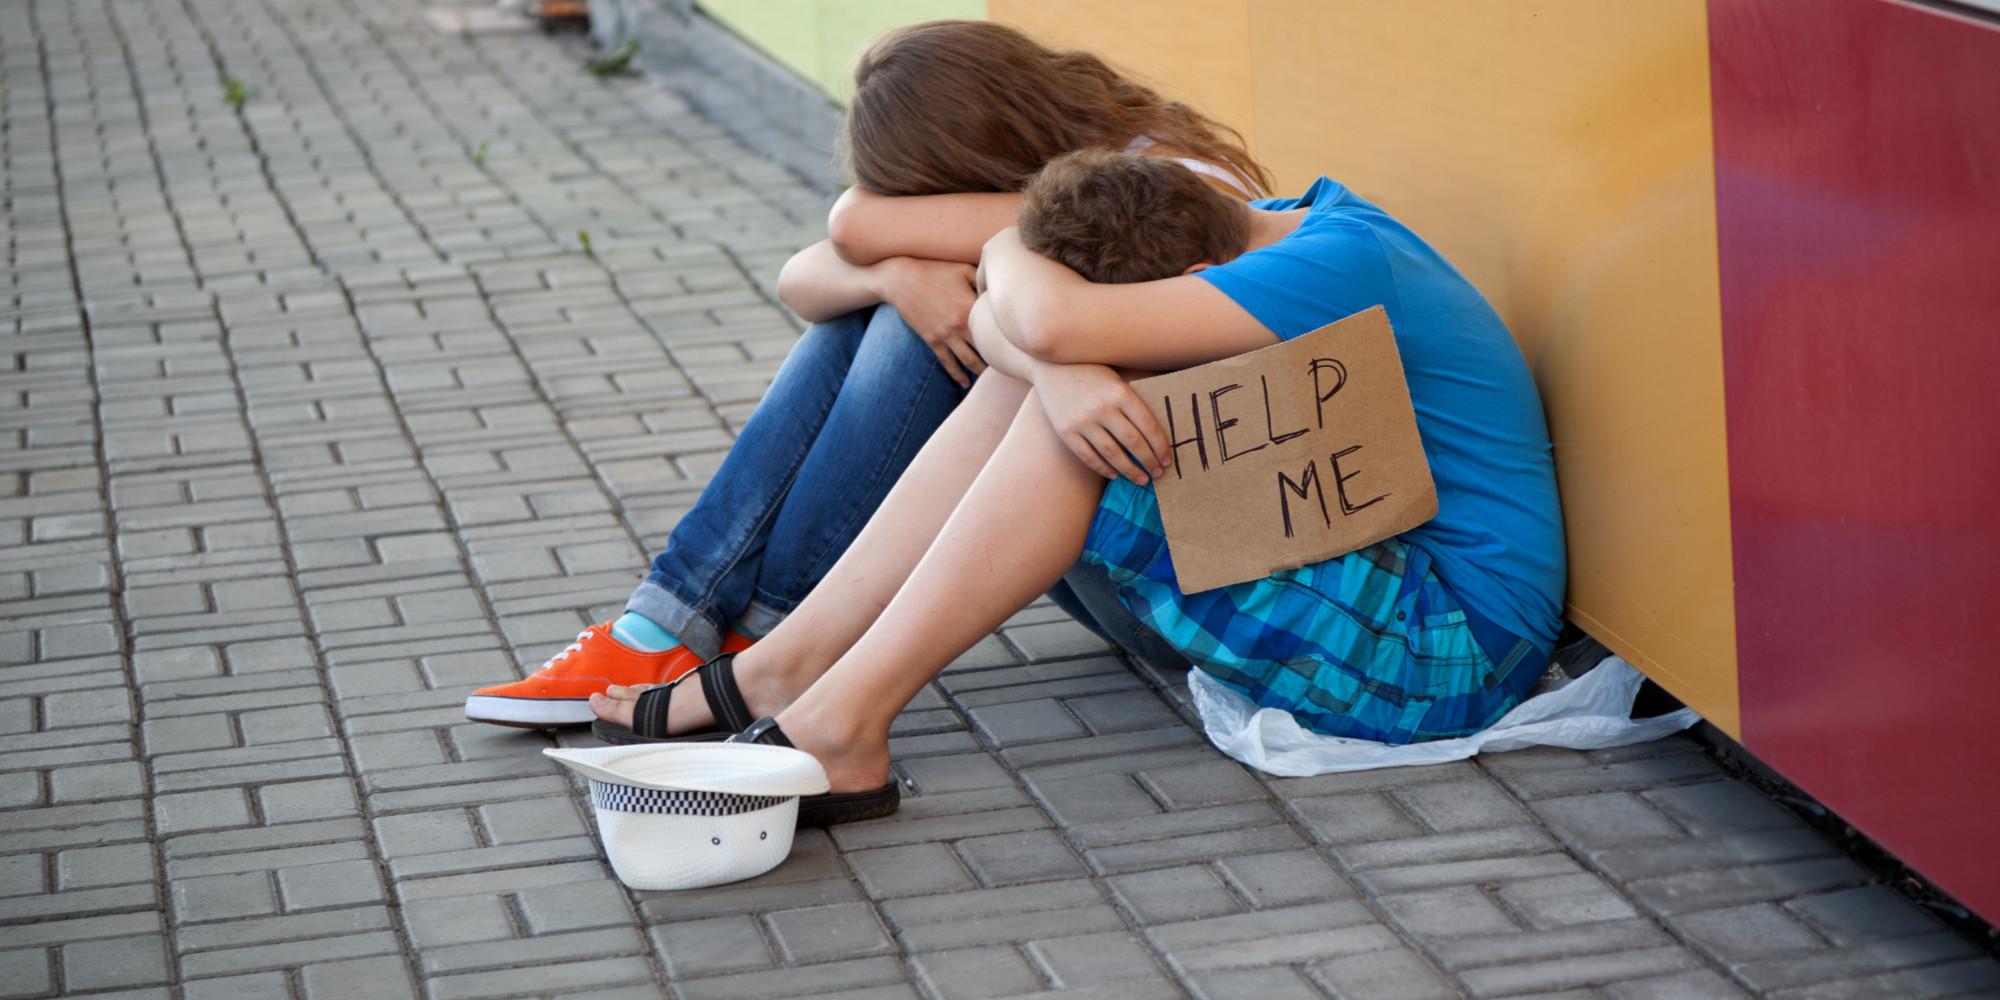 What Causes Homelessness? Homelessness as a Social Problem